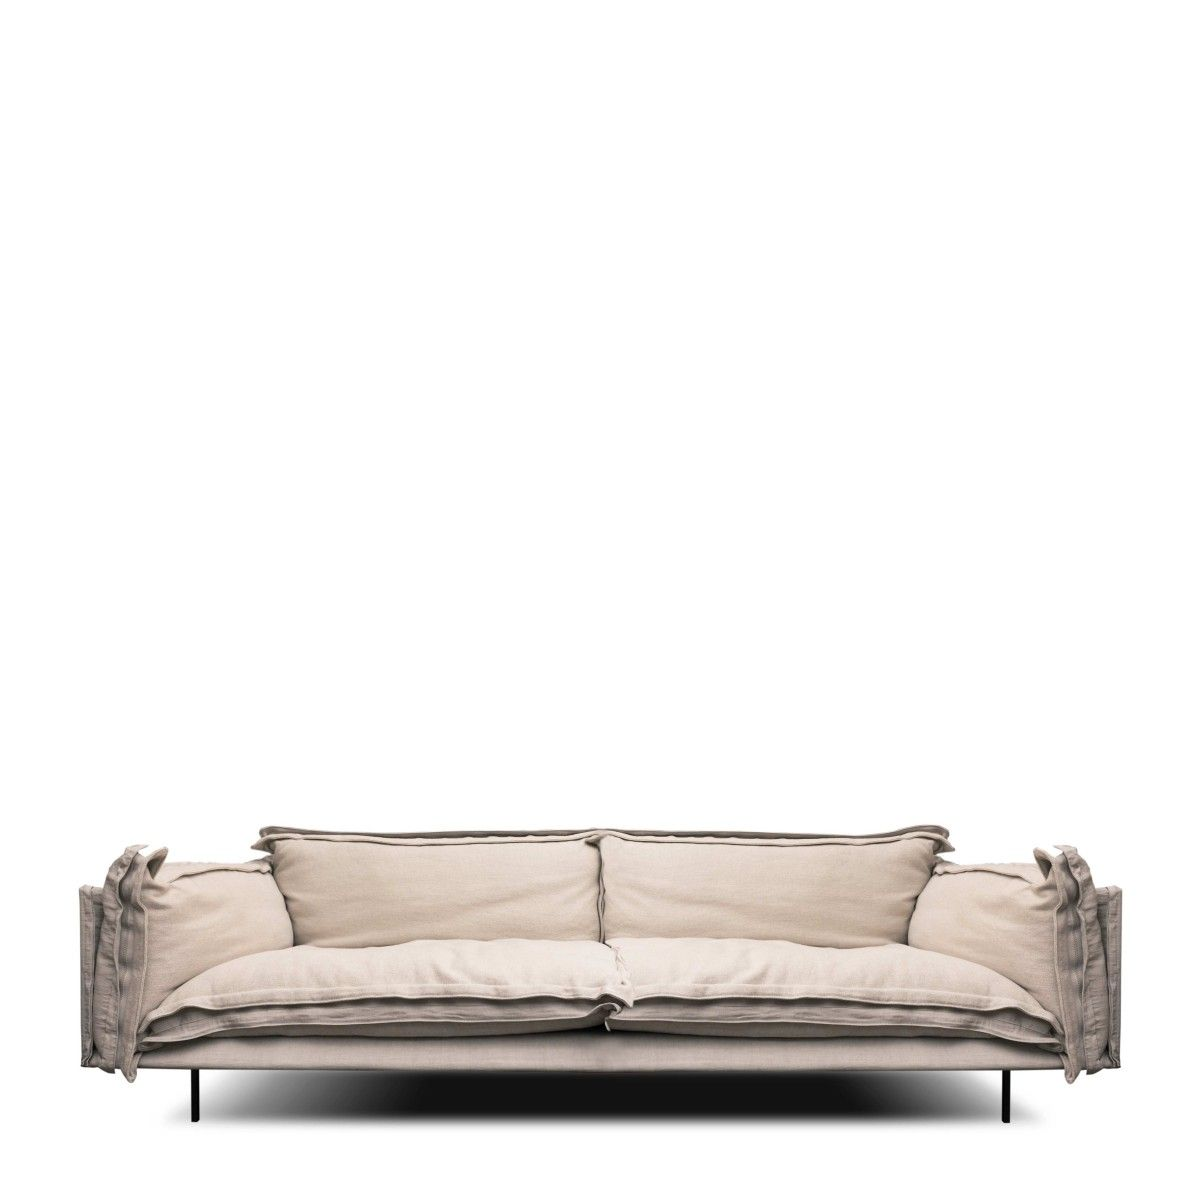 Enjoyable Arketipo Auto Reverse Sofa By Giuseppe Vigano At Decornyc Cjindustries Chair Design For Home Cjindustriesco